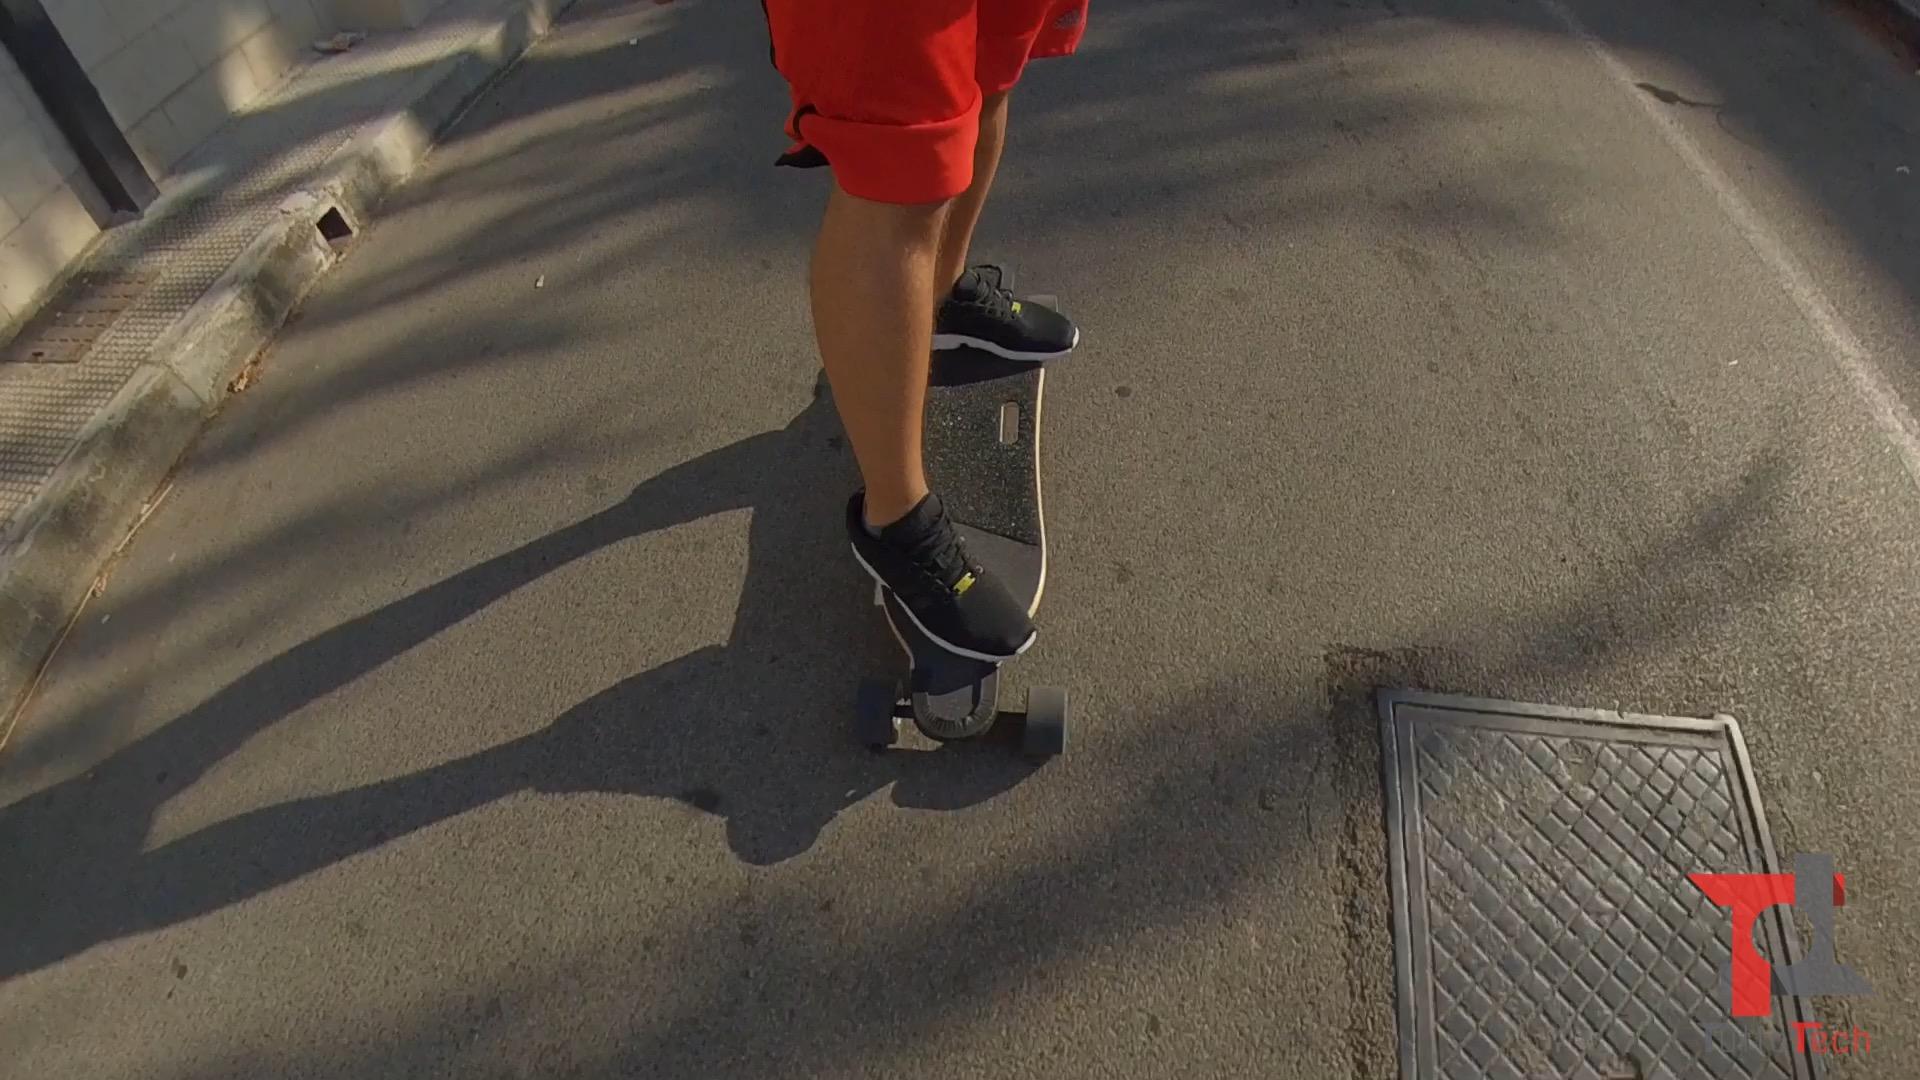 Recensione Ownboard W1S: il best buy degli skateboard elettrici 5